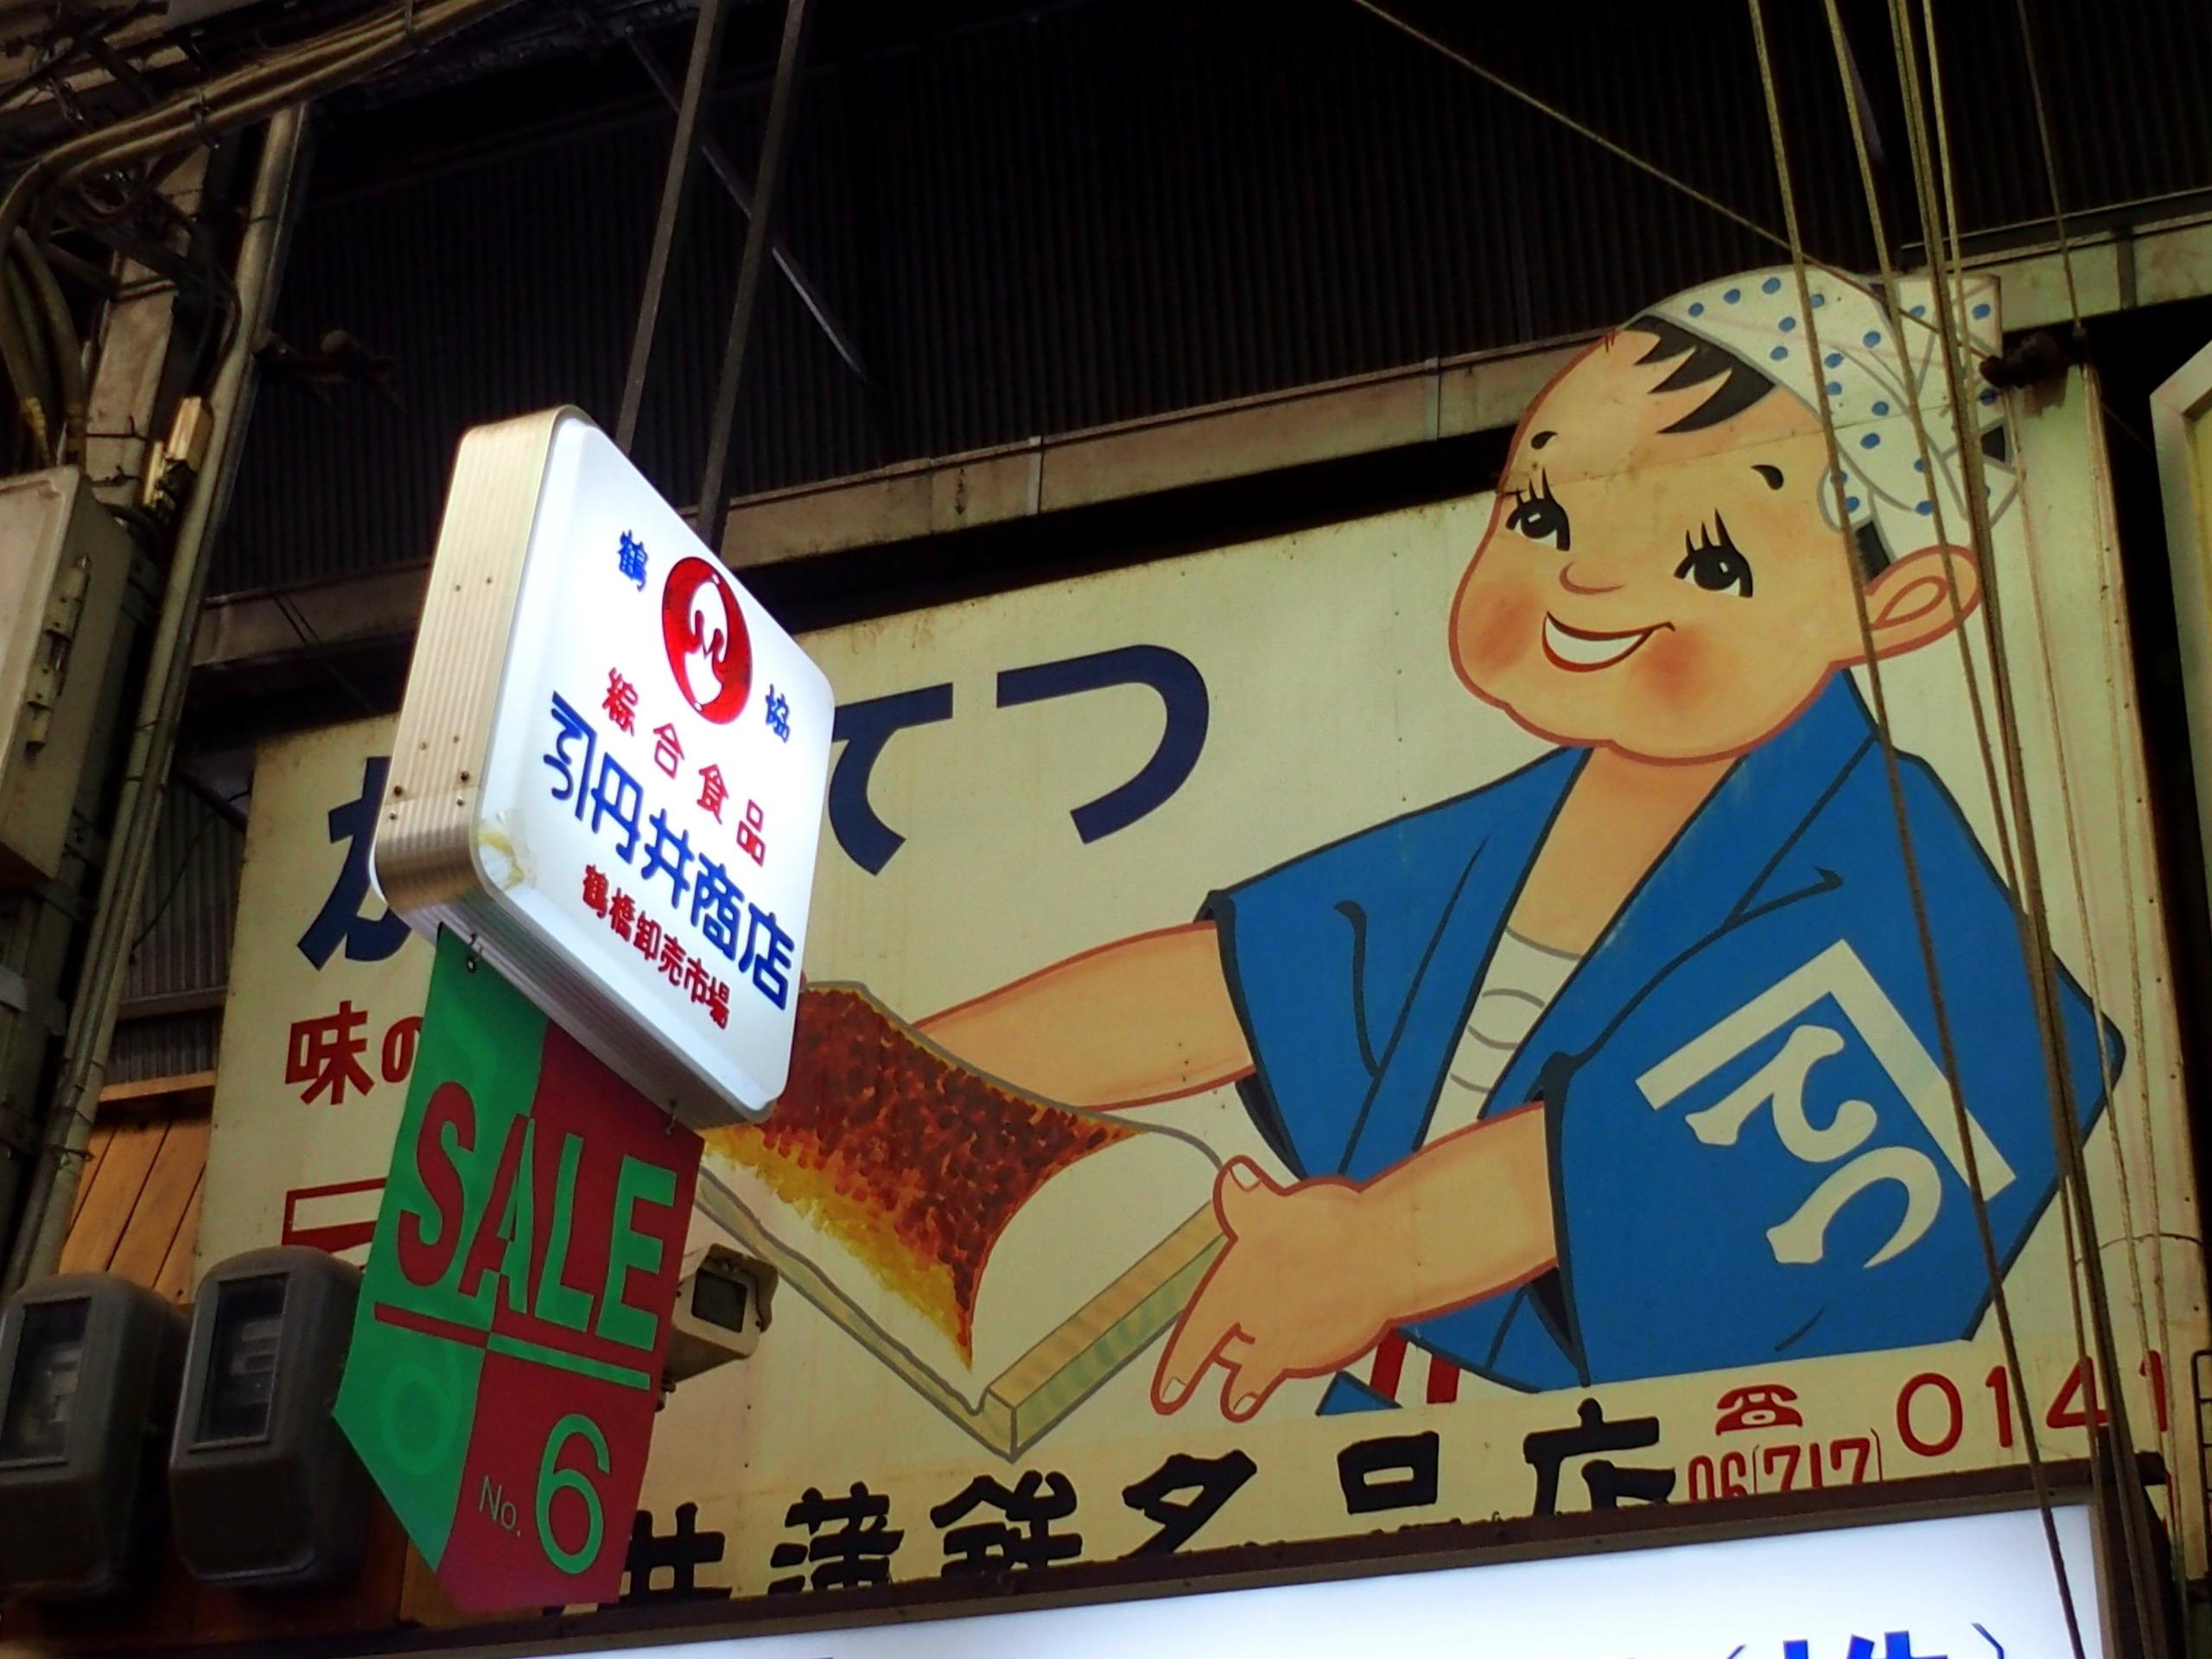 Enseigne boulangerie visite d'Osaka Japon